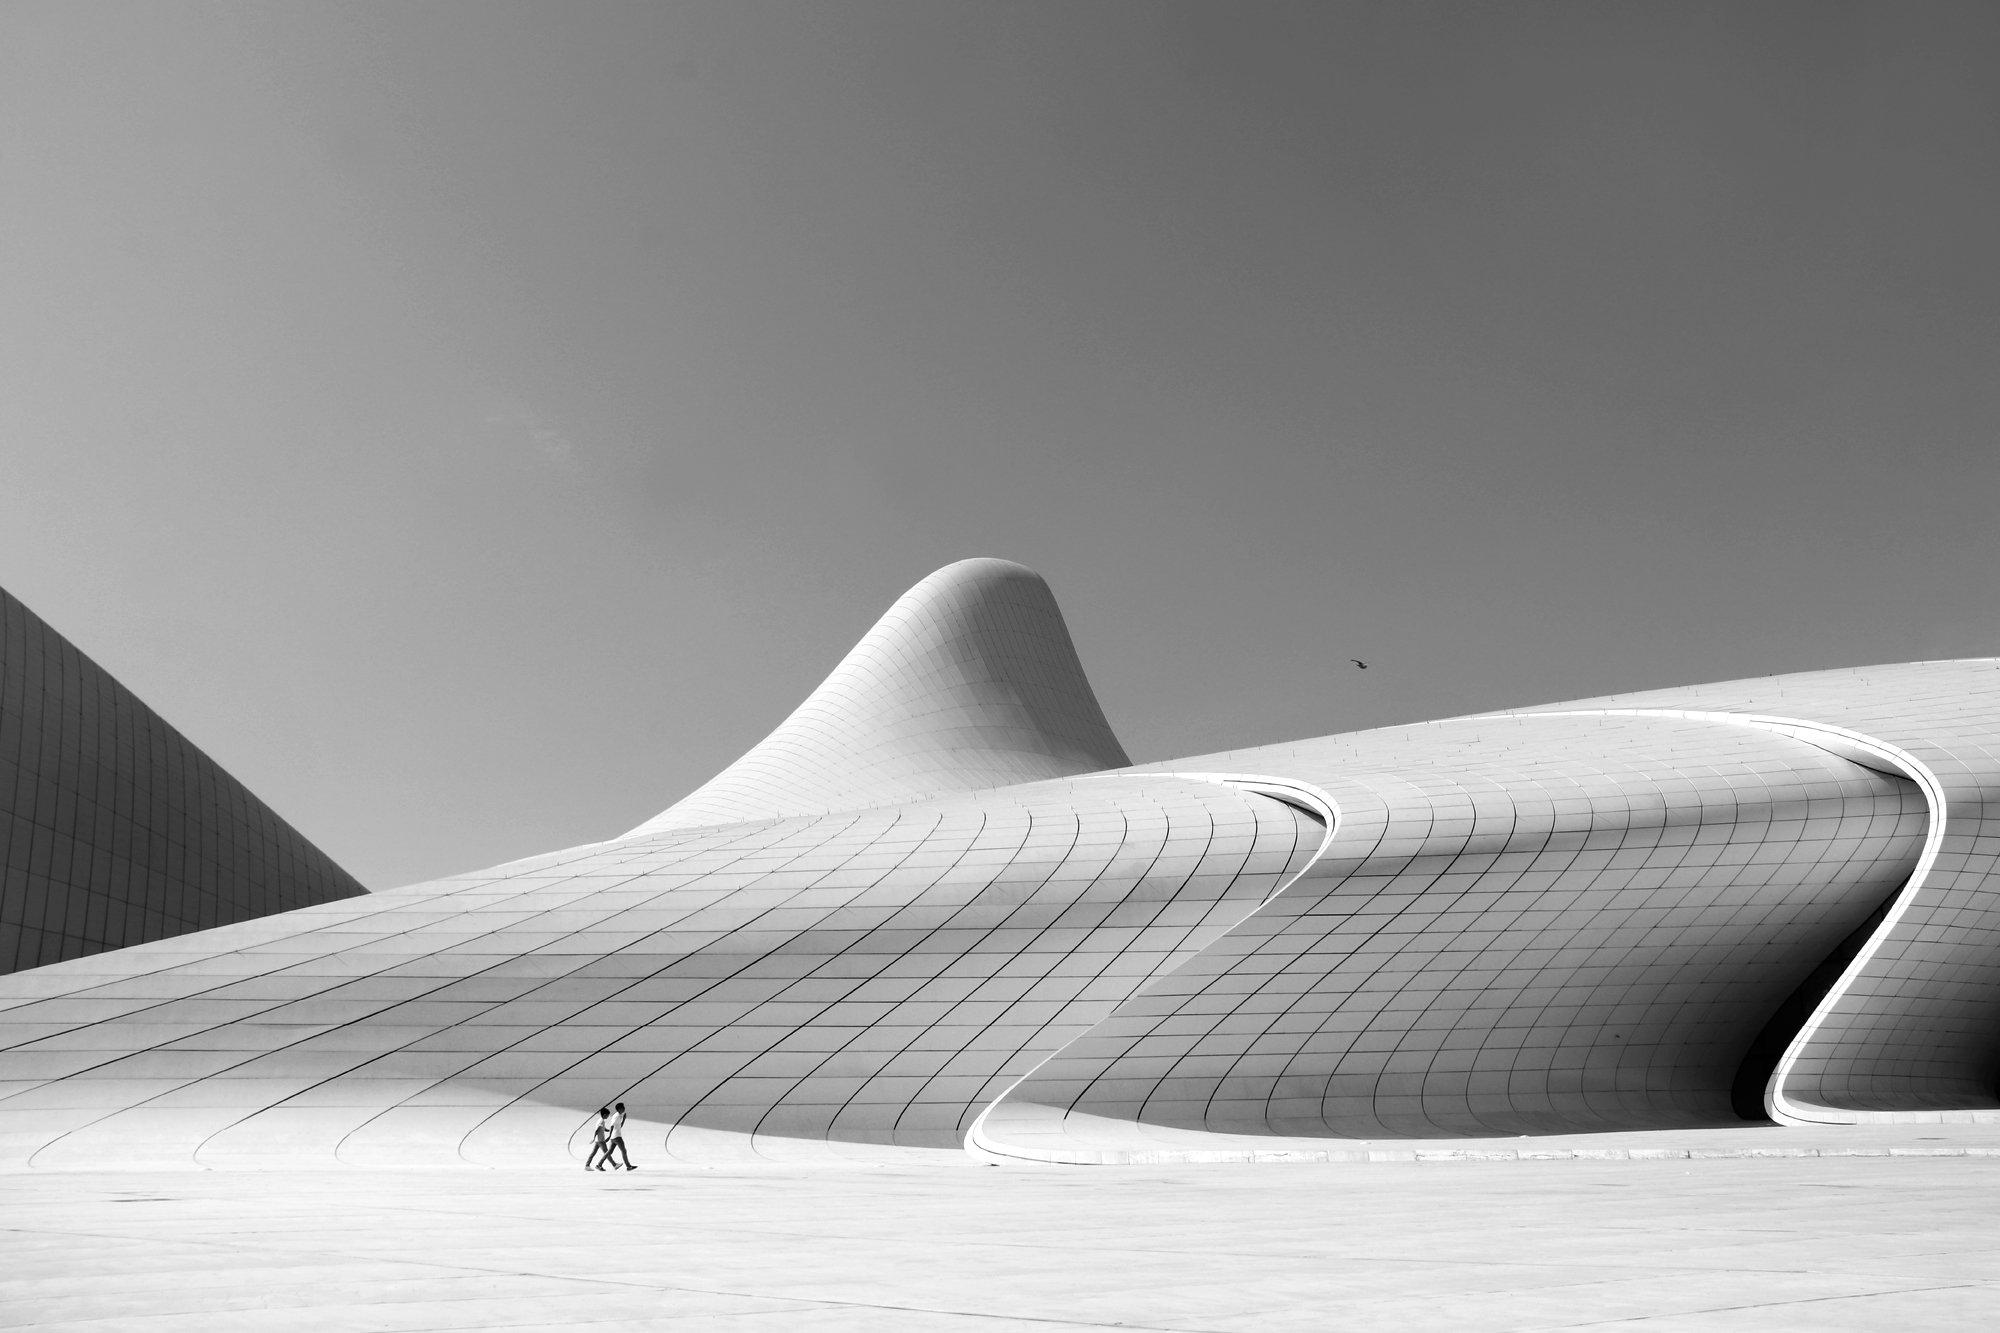 aliyev centre, architecture, luis lobo henriques, zaha hadid, azerbaijan, baku, travel, city, Lobo Henriques Luis